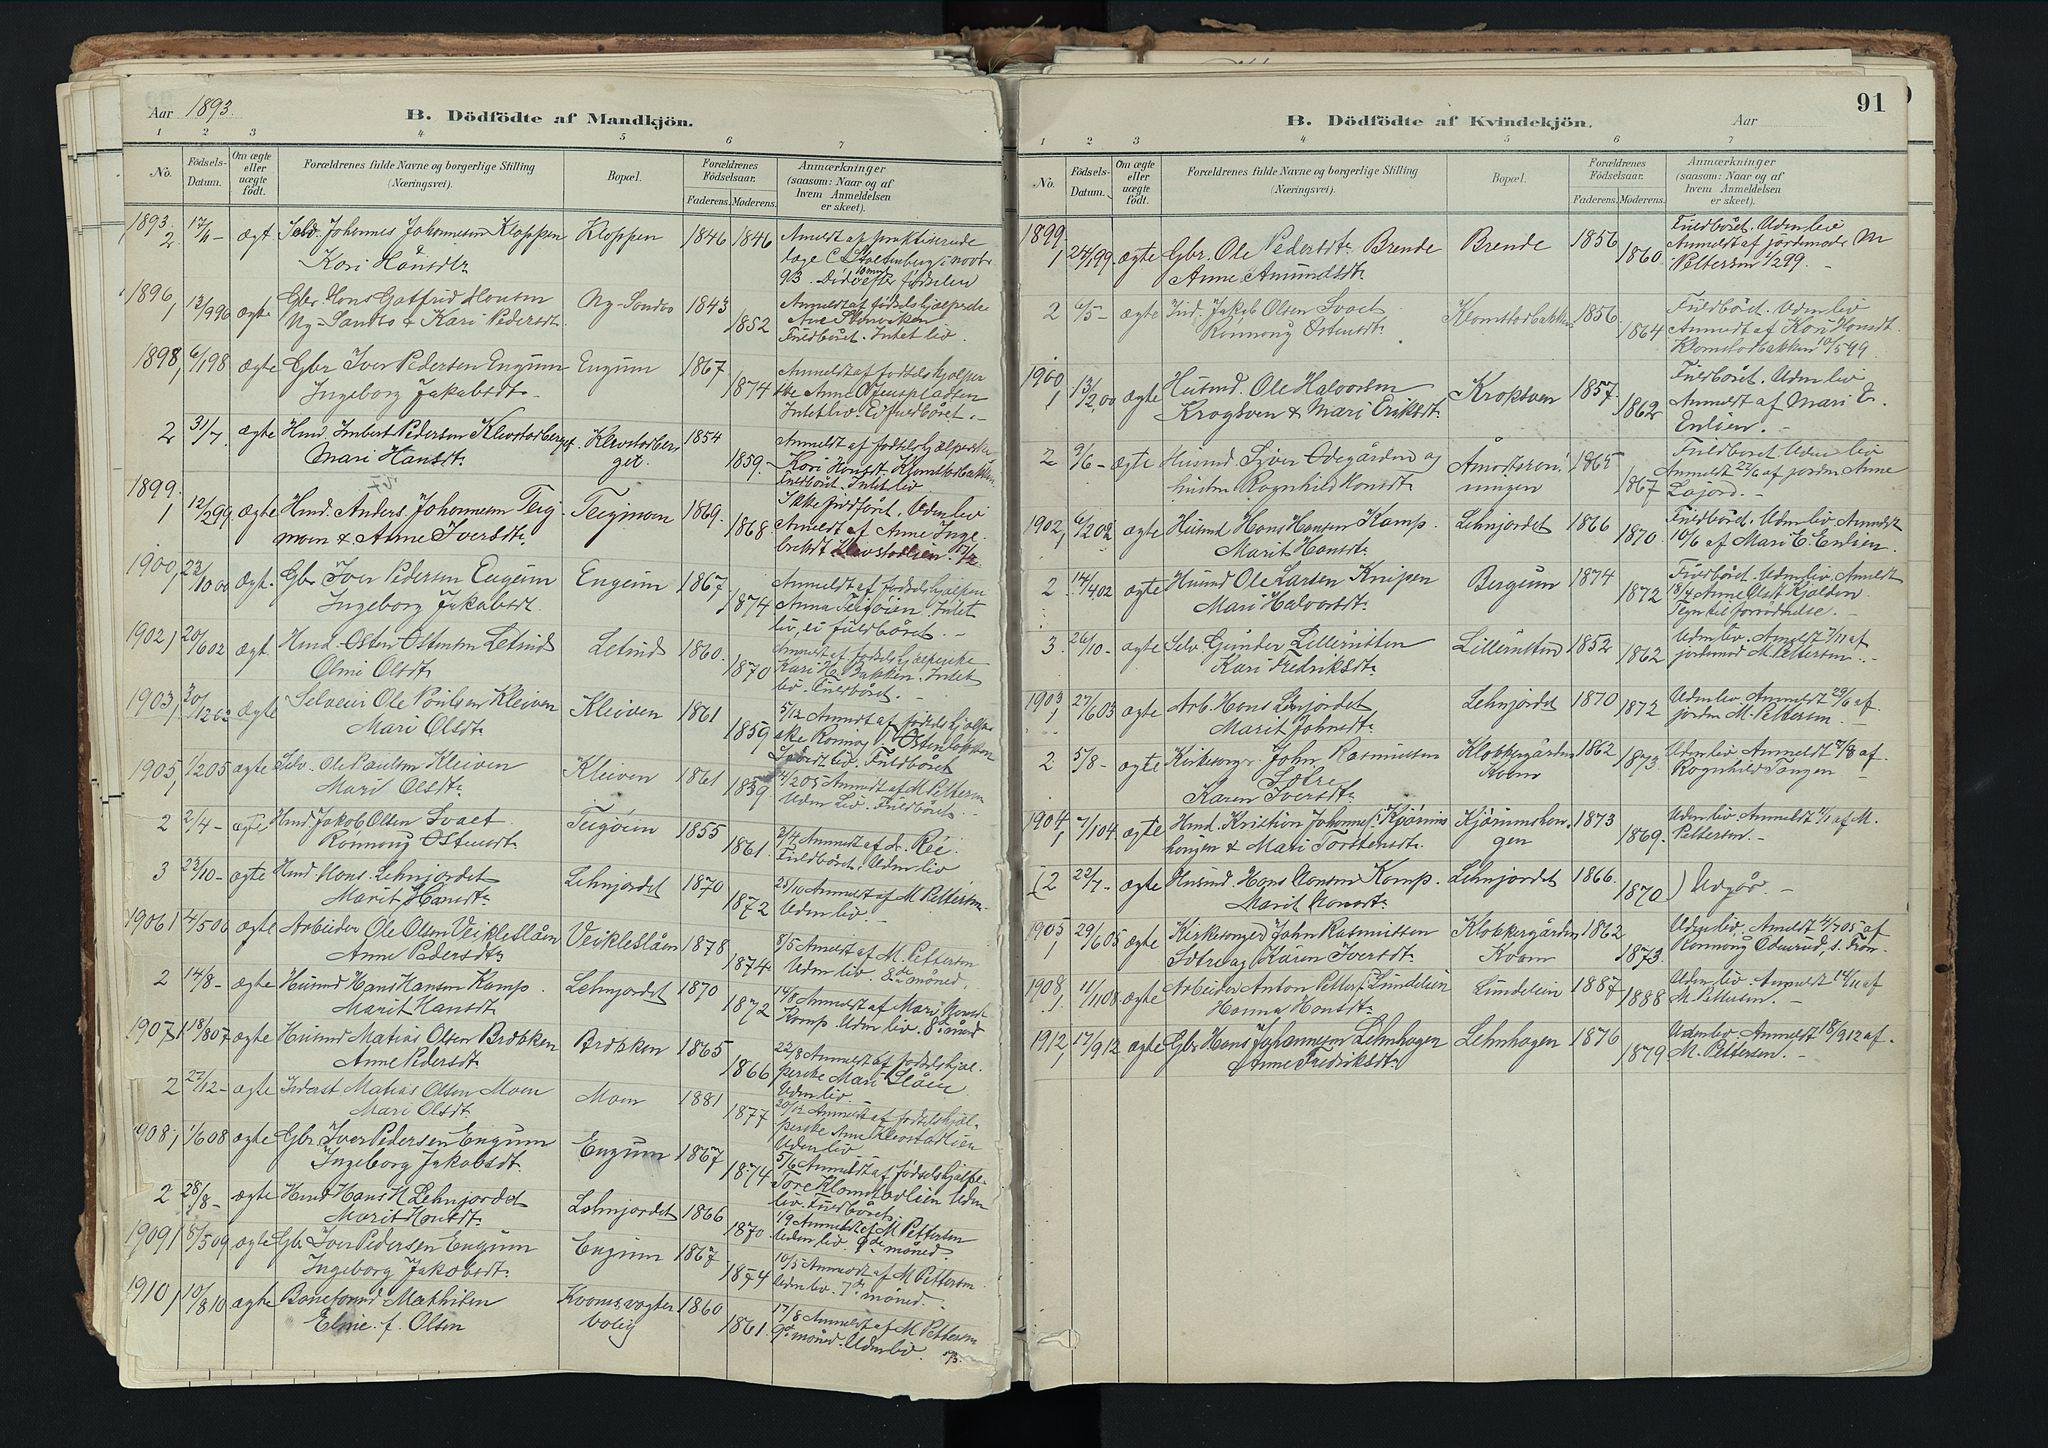 SAH, Nord-Fron prestekontor, Ministerialbok nr. 3, 1884-1914, s. 91